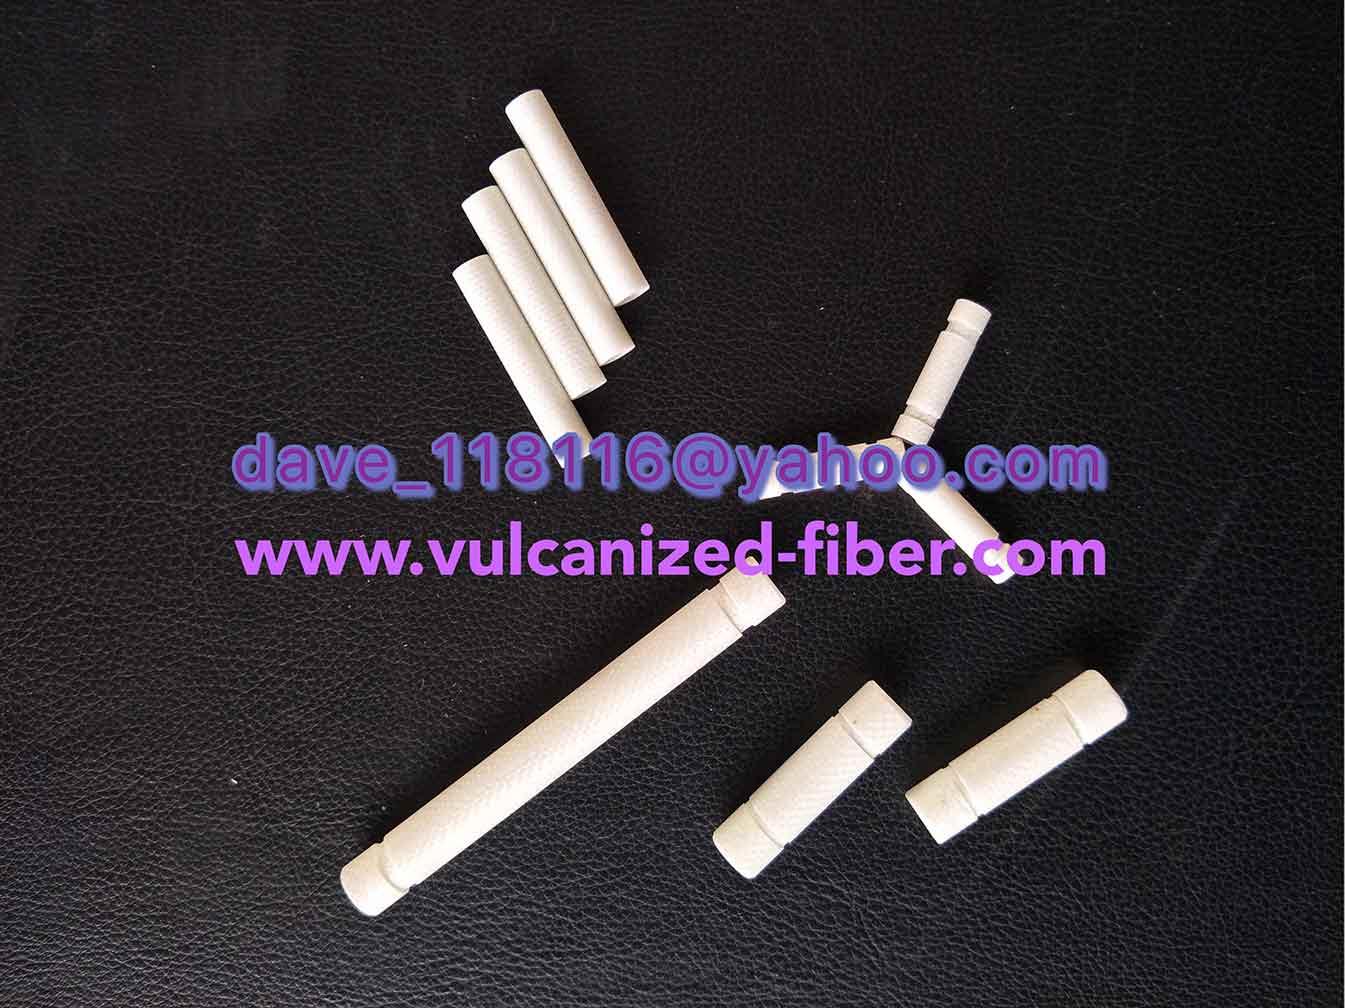 power fusespv fusesNEMA G5G9 Melamine fiberglass Laminates Tubes Melamine Tubes